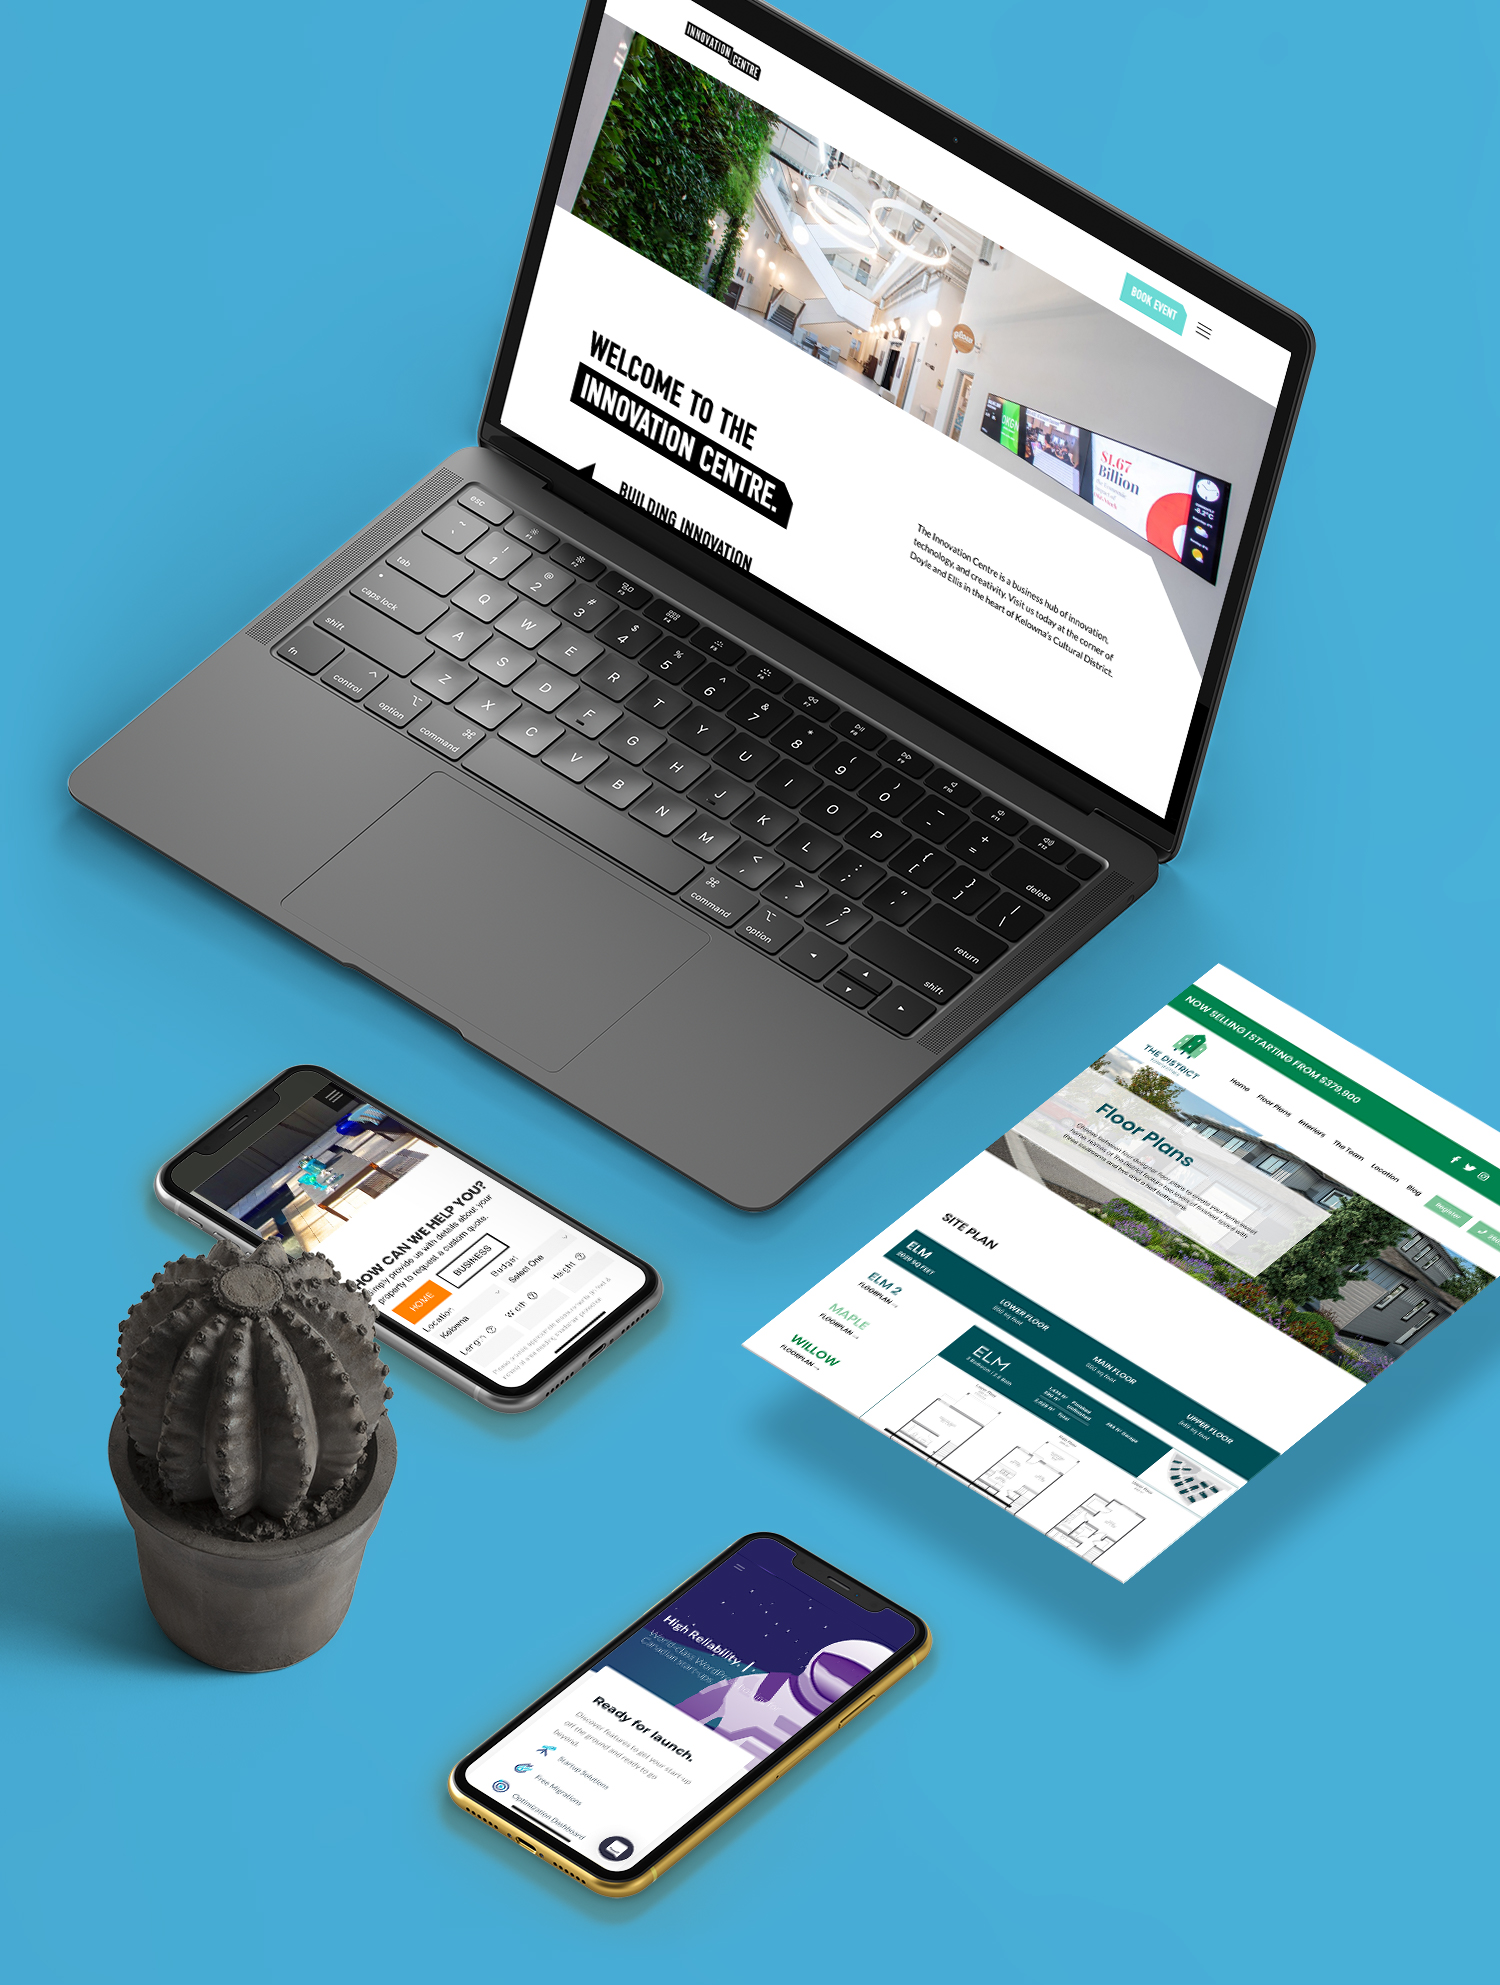 WordPress development mockups of various websites designed by Twirling Umbrellas